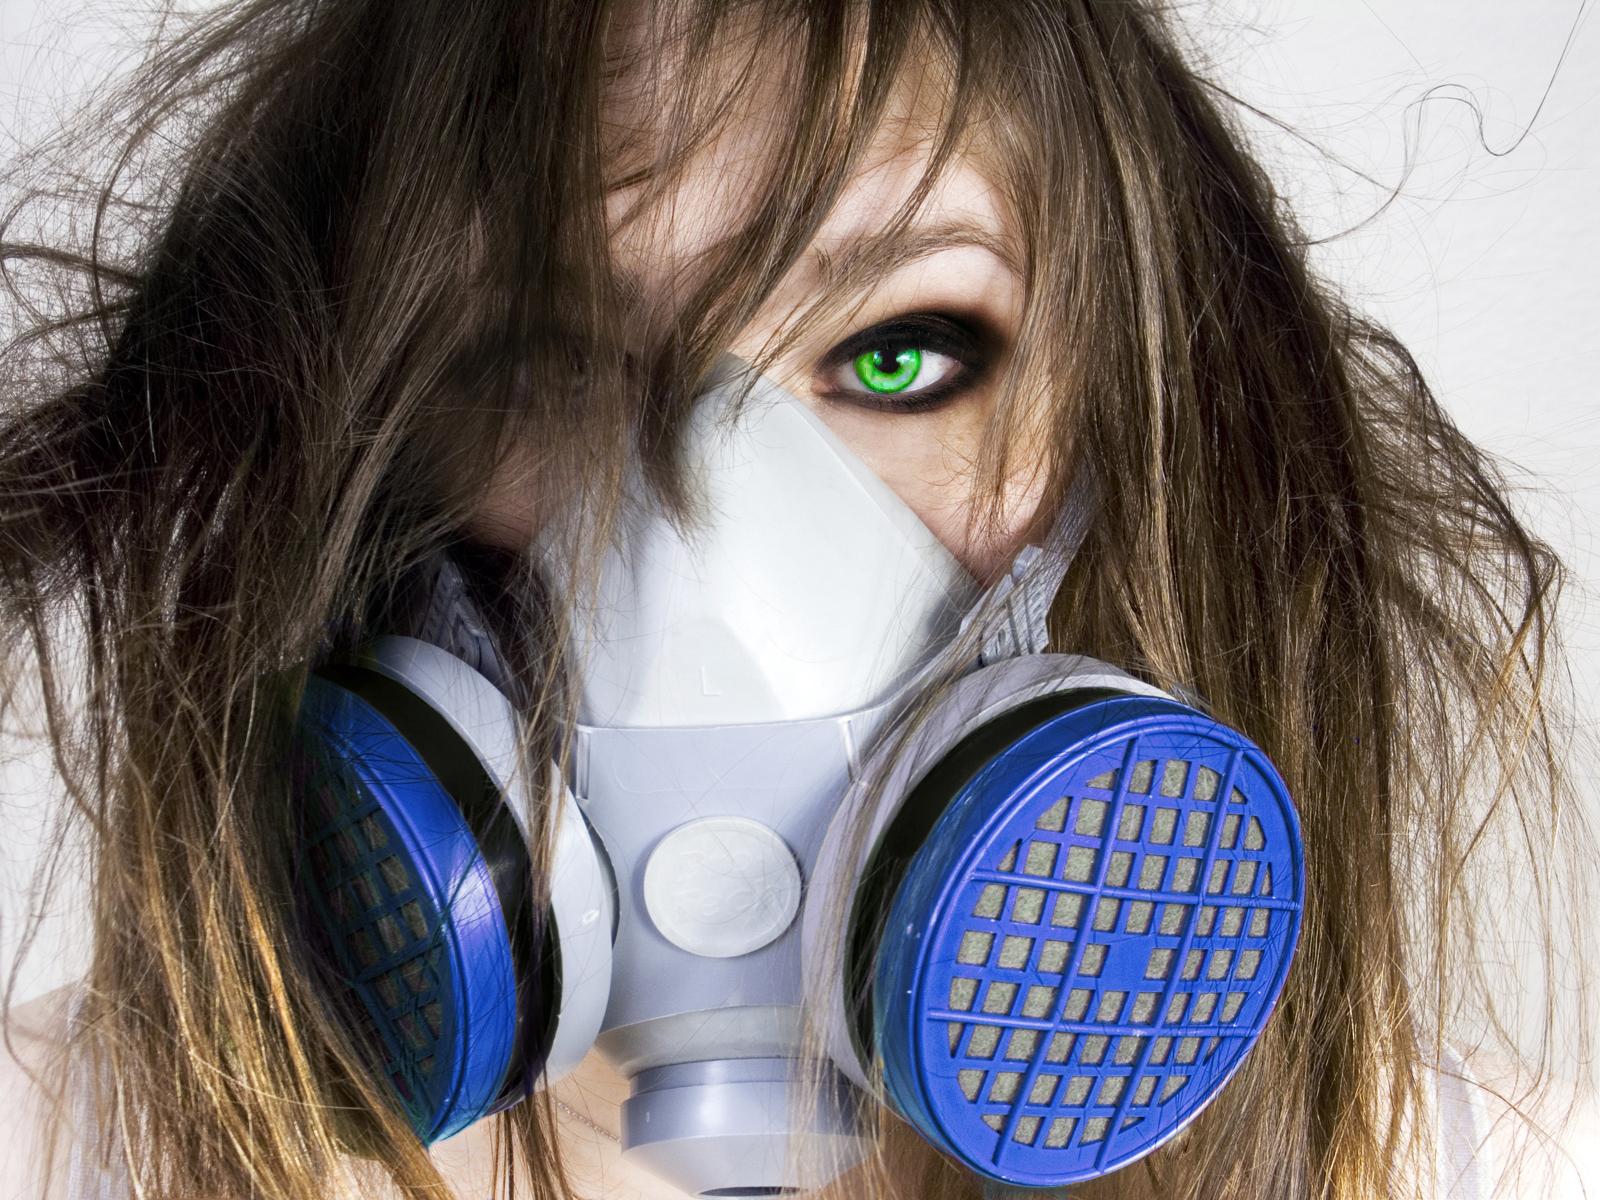 http://4.bp.blogspot.com/-EYFfugrCD2Q/Tgz1qpvgrHI/AAAAAAAAIGU/L369iQ0wfxA/s1600/girl+green+eyes+gasmask+hd+wallpaper.jpg